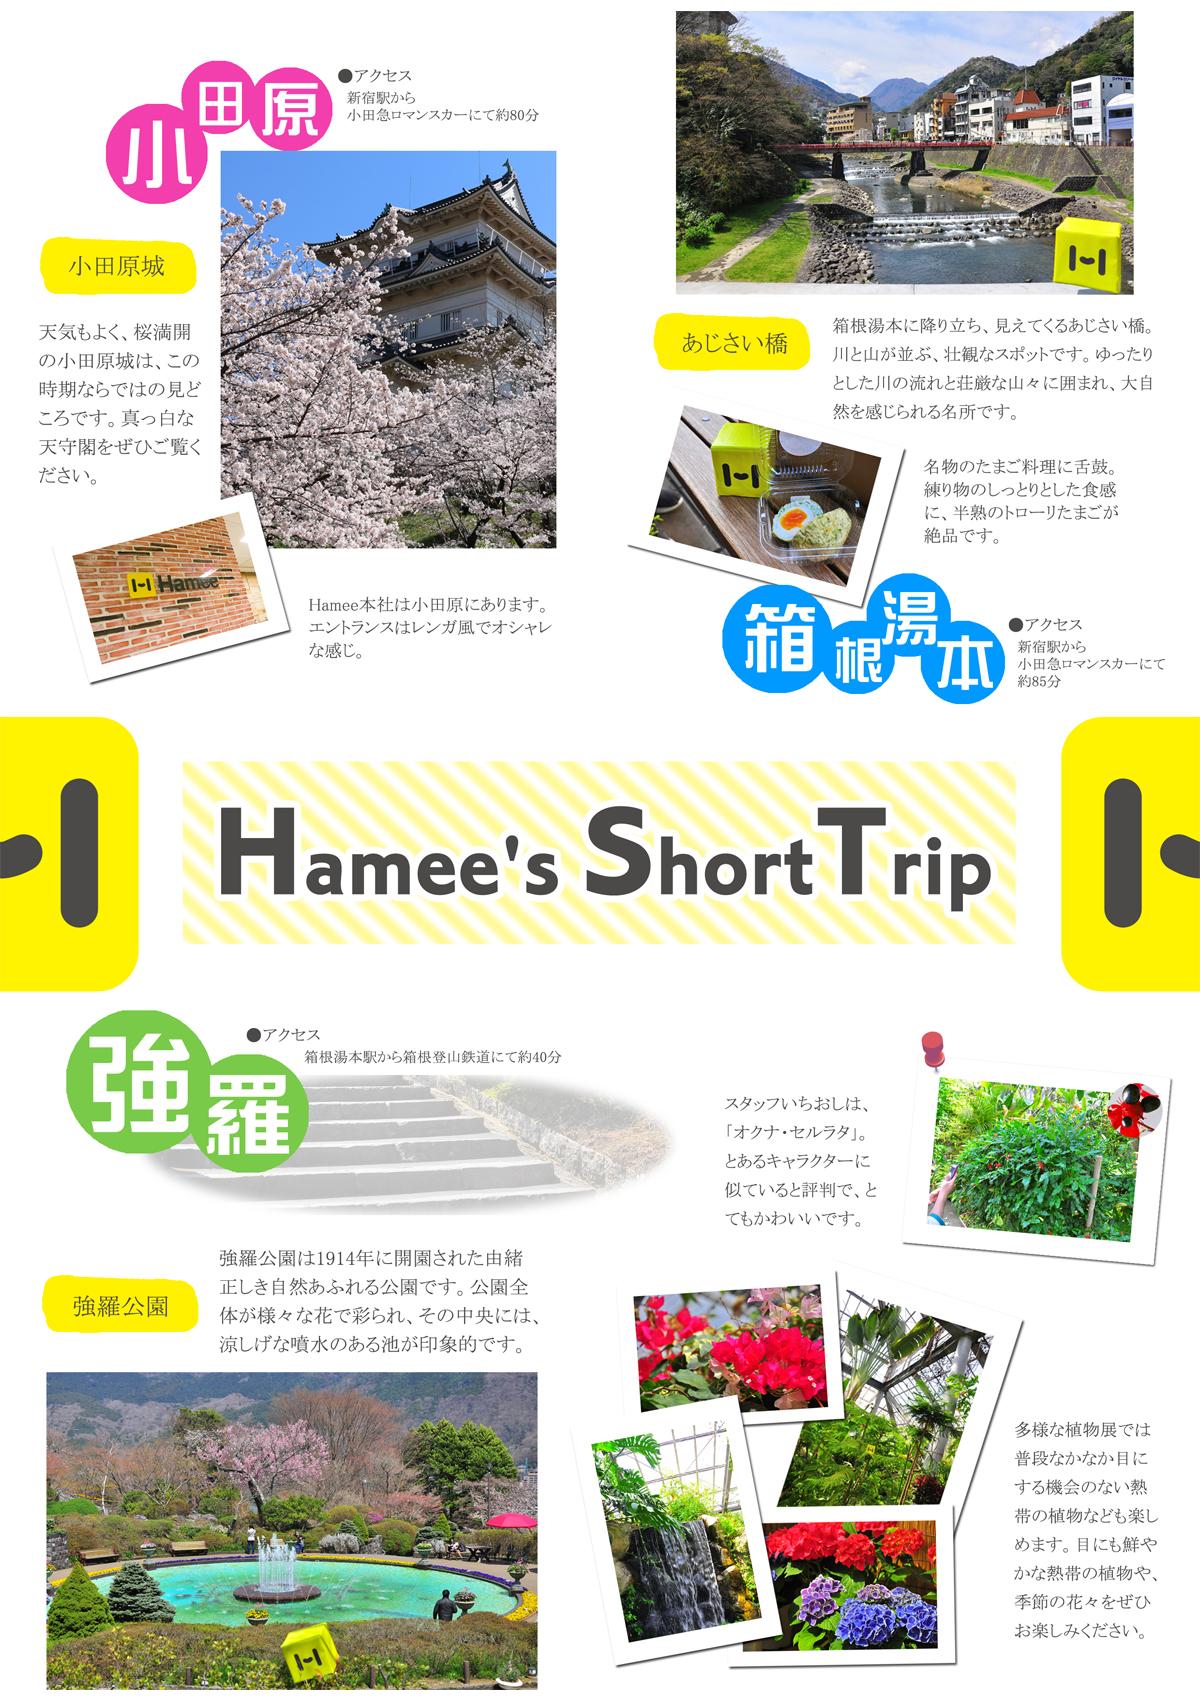 Hamee's Short Trip 小田原・箱根湯本・強羅編